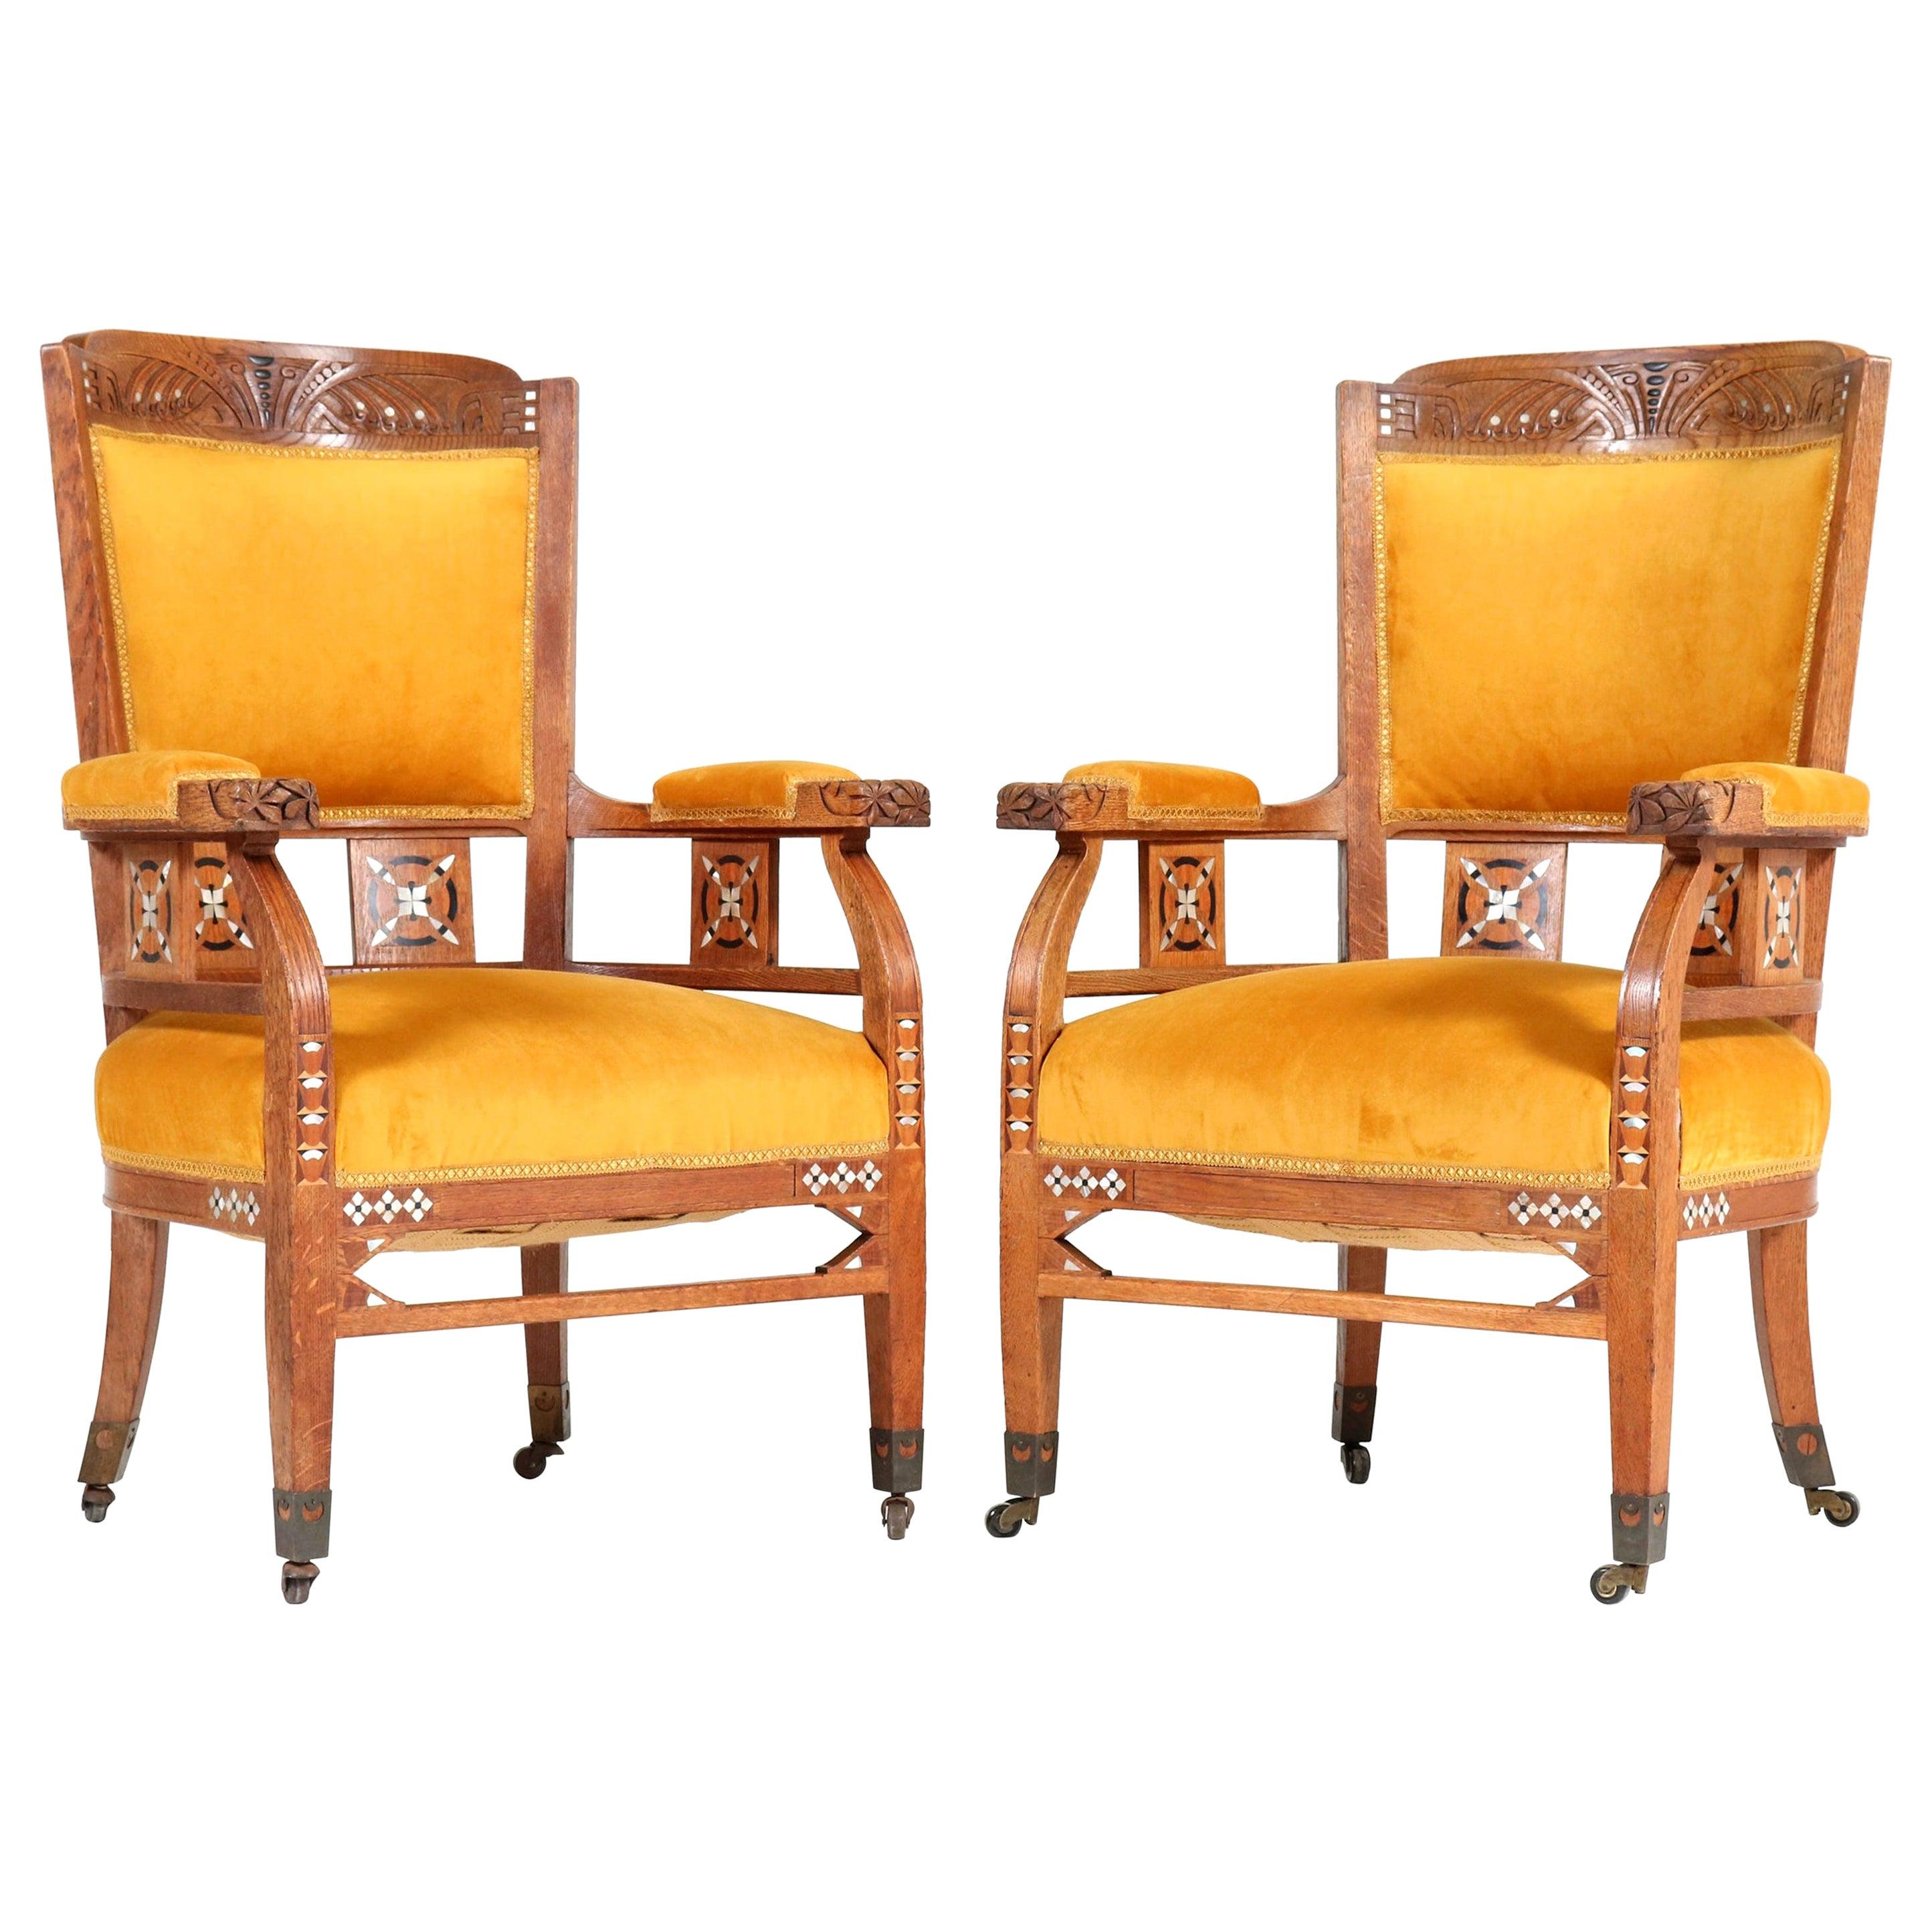 Oak Art Nouveau Arts & Crafts Armchairs by H.F. Jansen en Zonen Amsterdam, 1900s